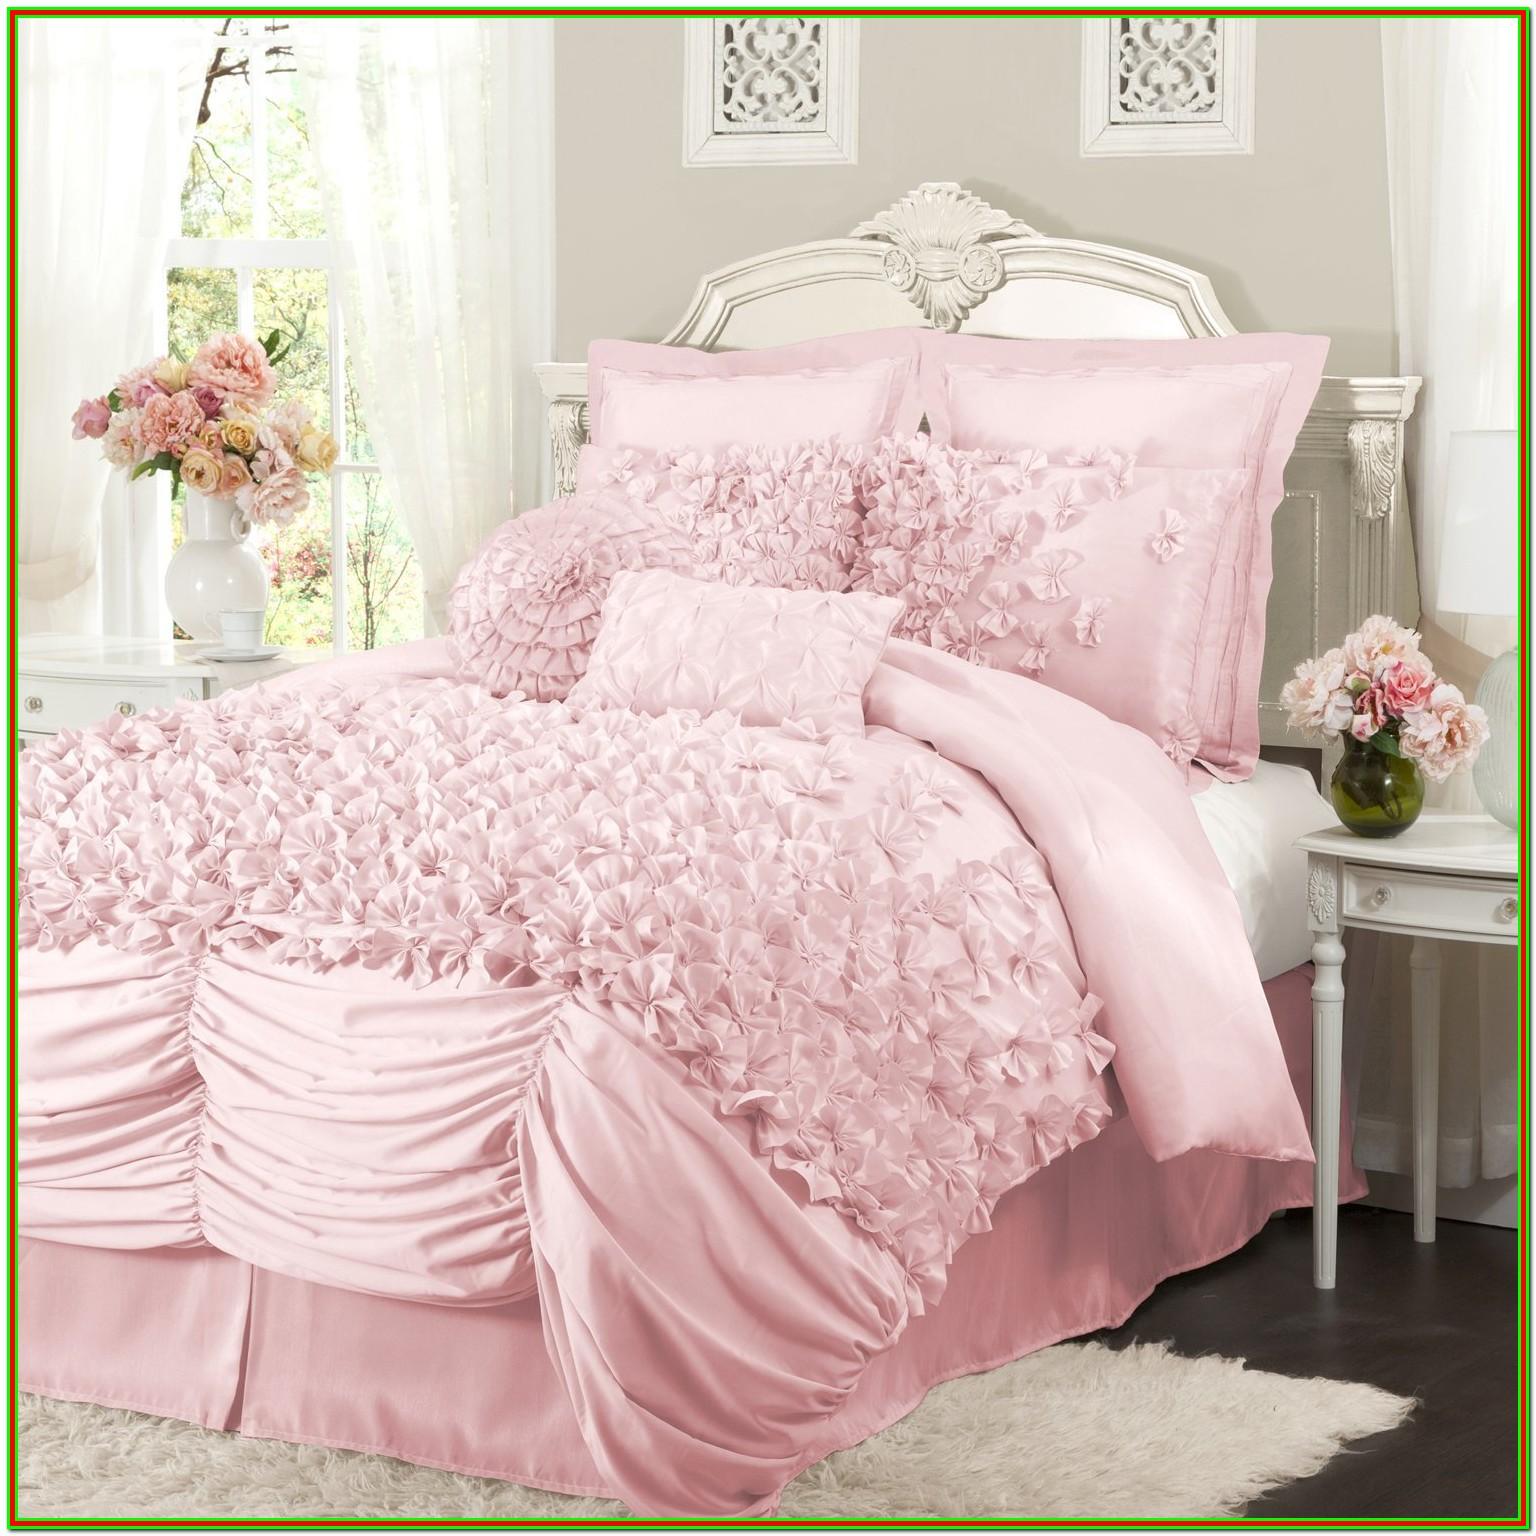 Pink Full Size Bed Set